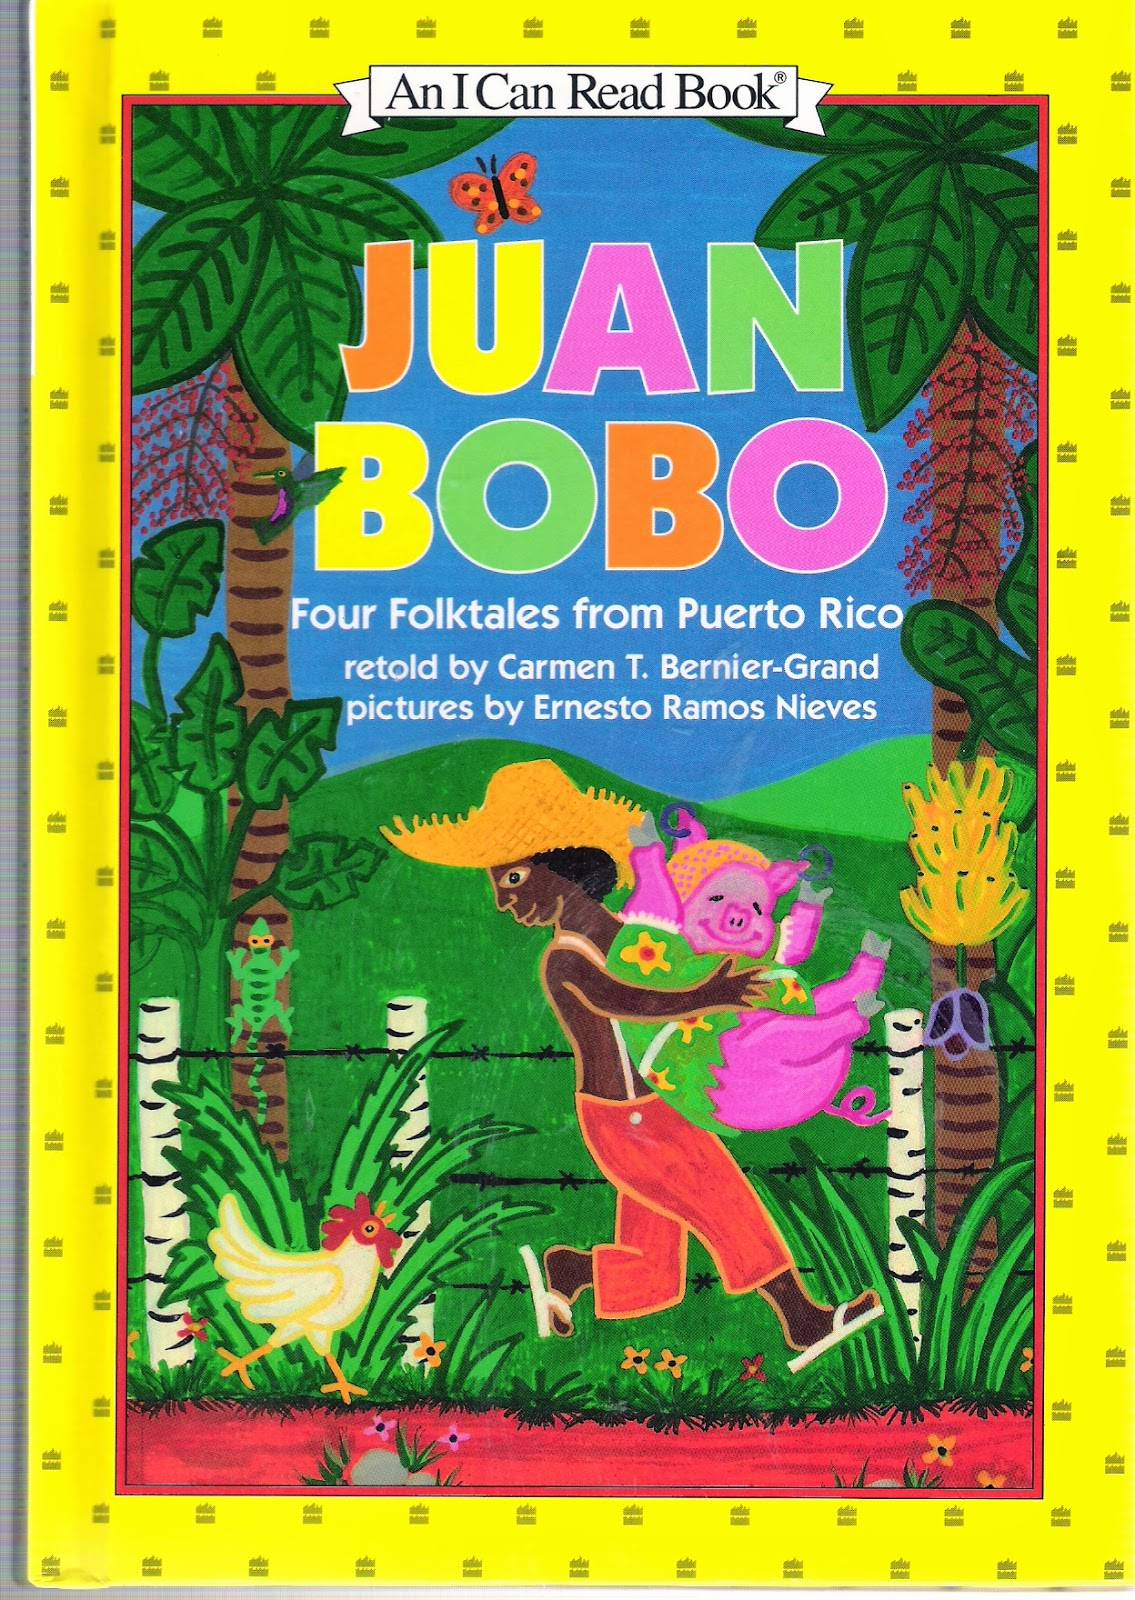 Juan Bobo Four Folktales From Puerto Rico